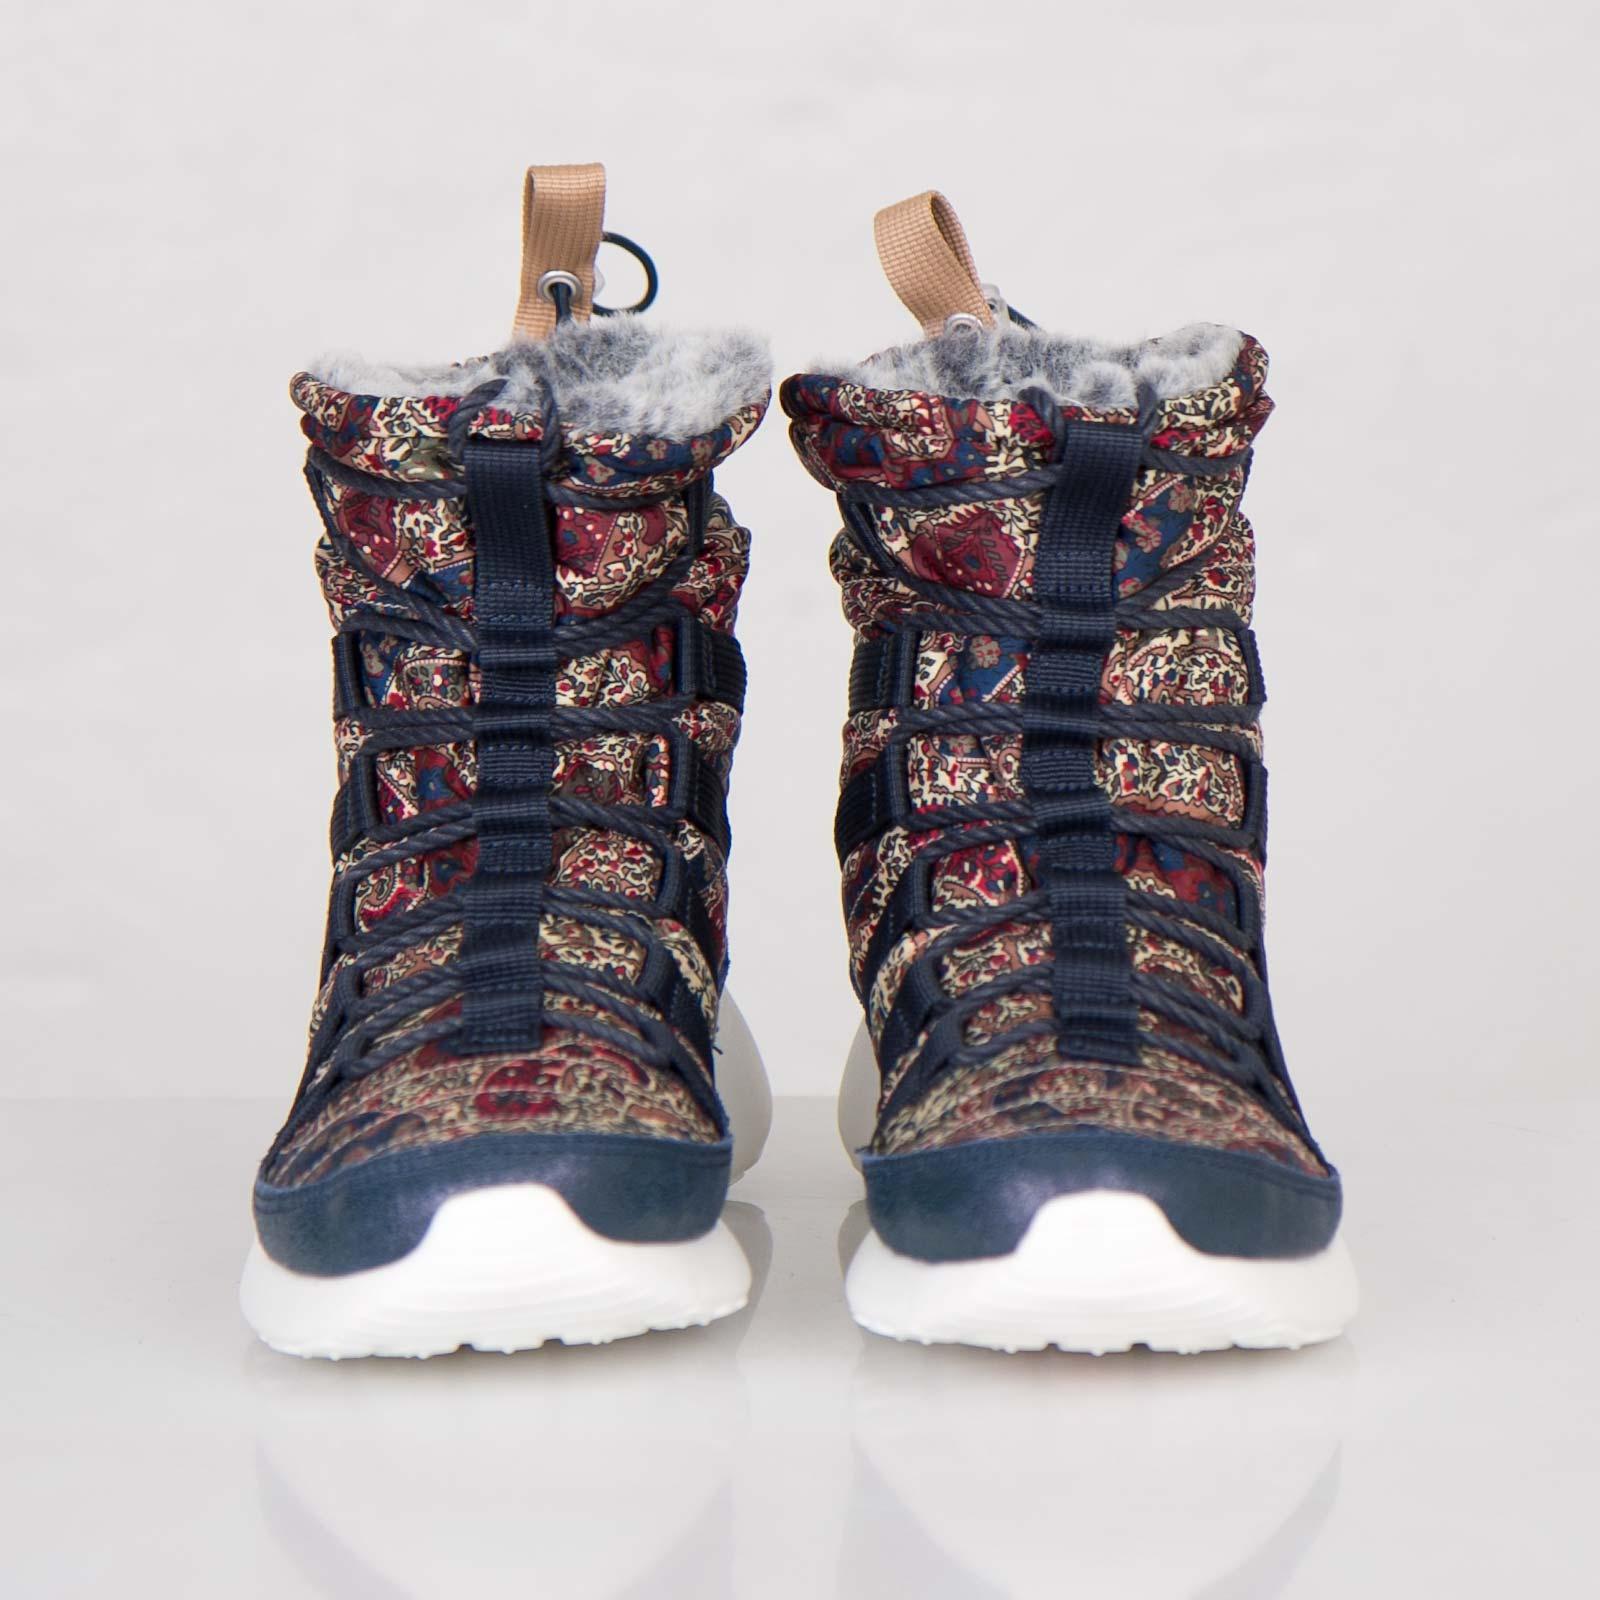 premium selection 063a1 4dec7 Nike Wmns Roshe Run Hi Sneakerboot Liberty QS - 633519-402 - Sneakersnstuff    sneakers   streetwear online since 1999